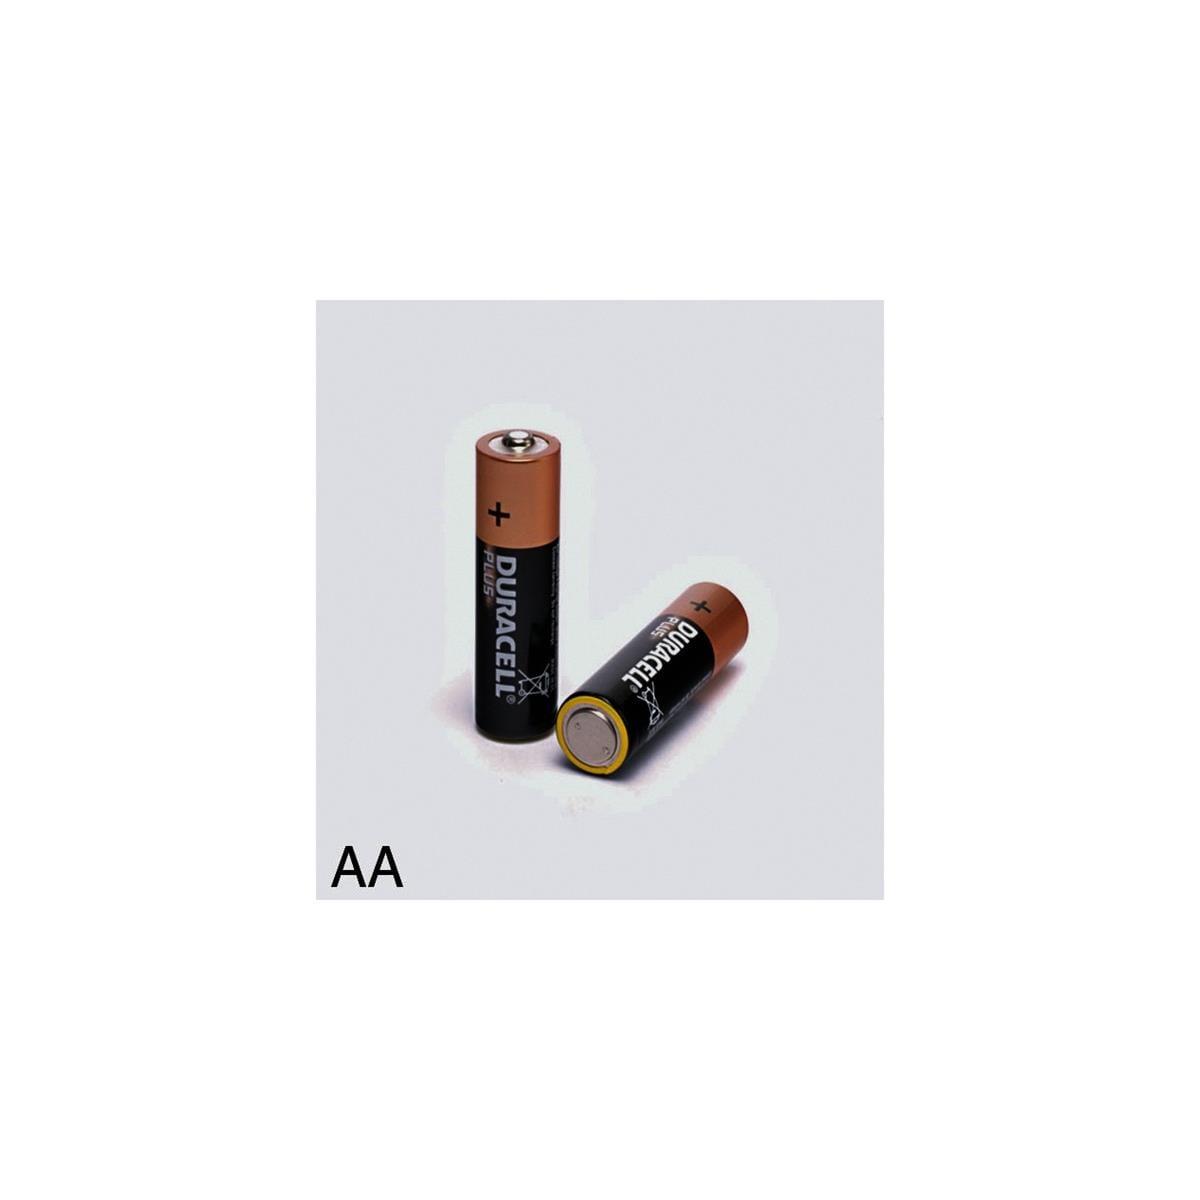 Duracell AA Size Batteries 4pk